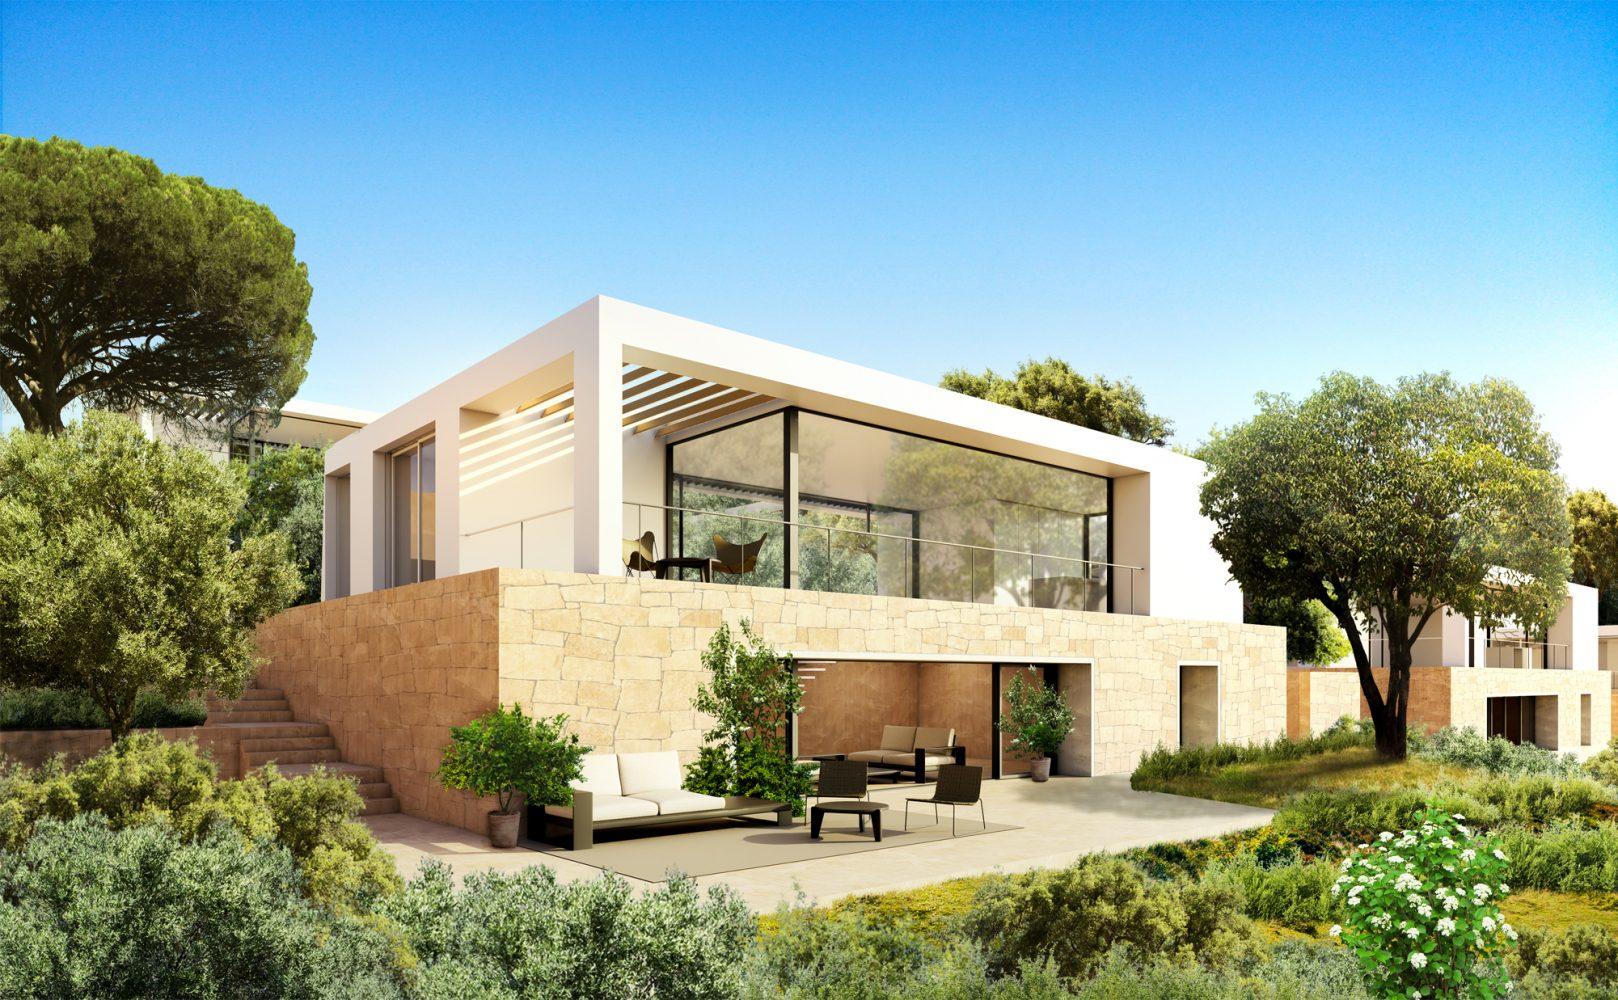 Lecoc arquitectura_arquitecto_valencia_mallorca_cala_murada_vivienda_diseño_sostenible_05